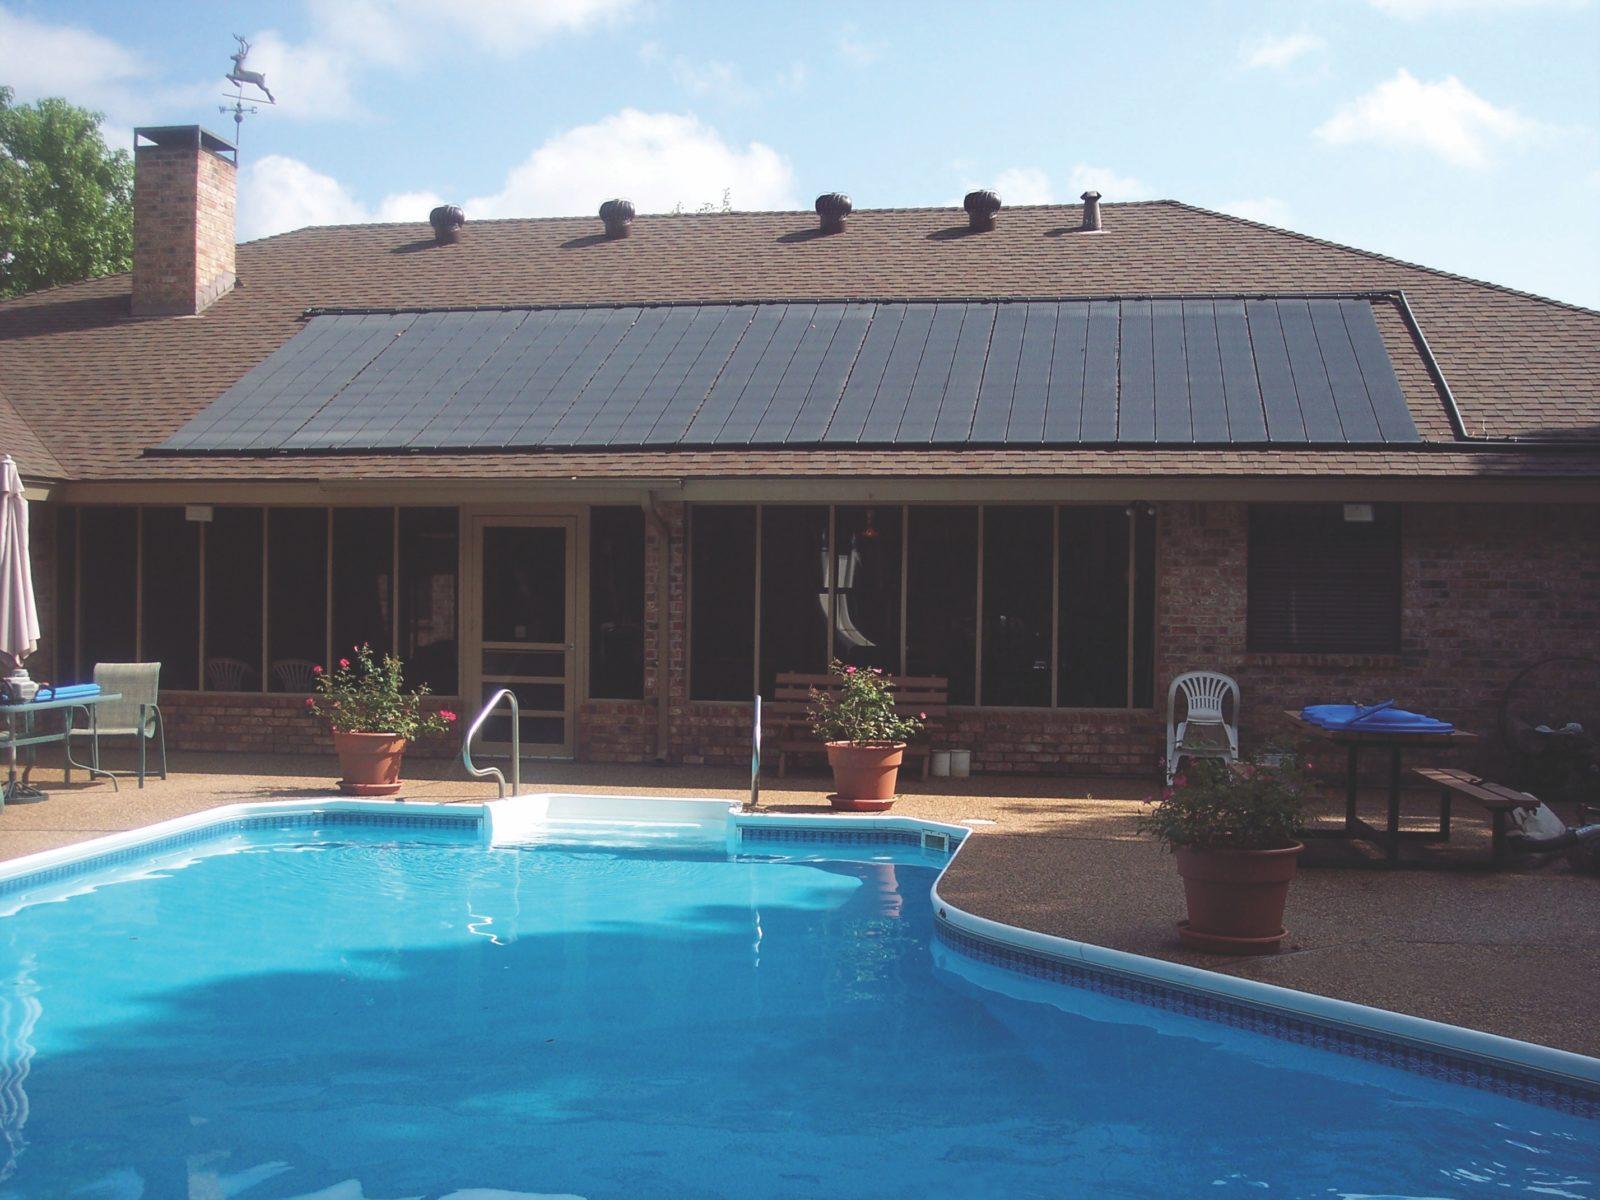 Heliocol Solar Pool Heating Gallery Image